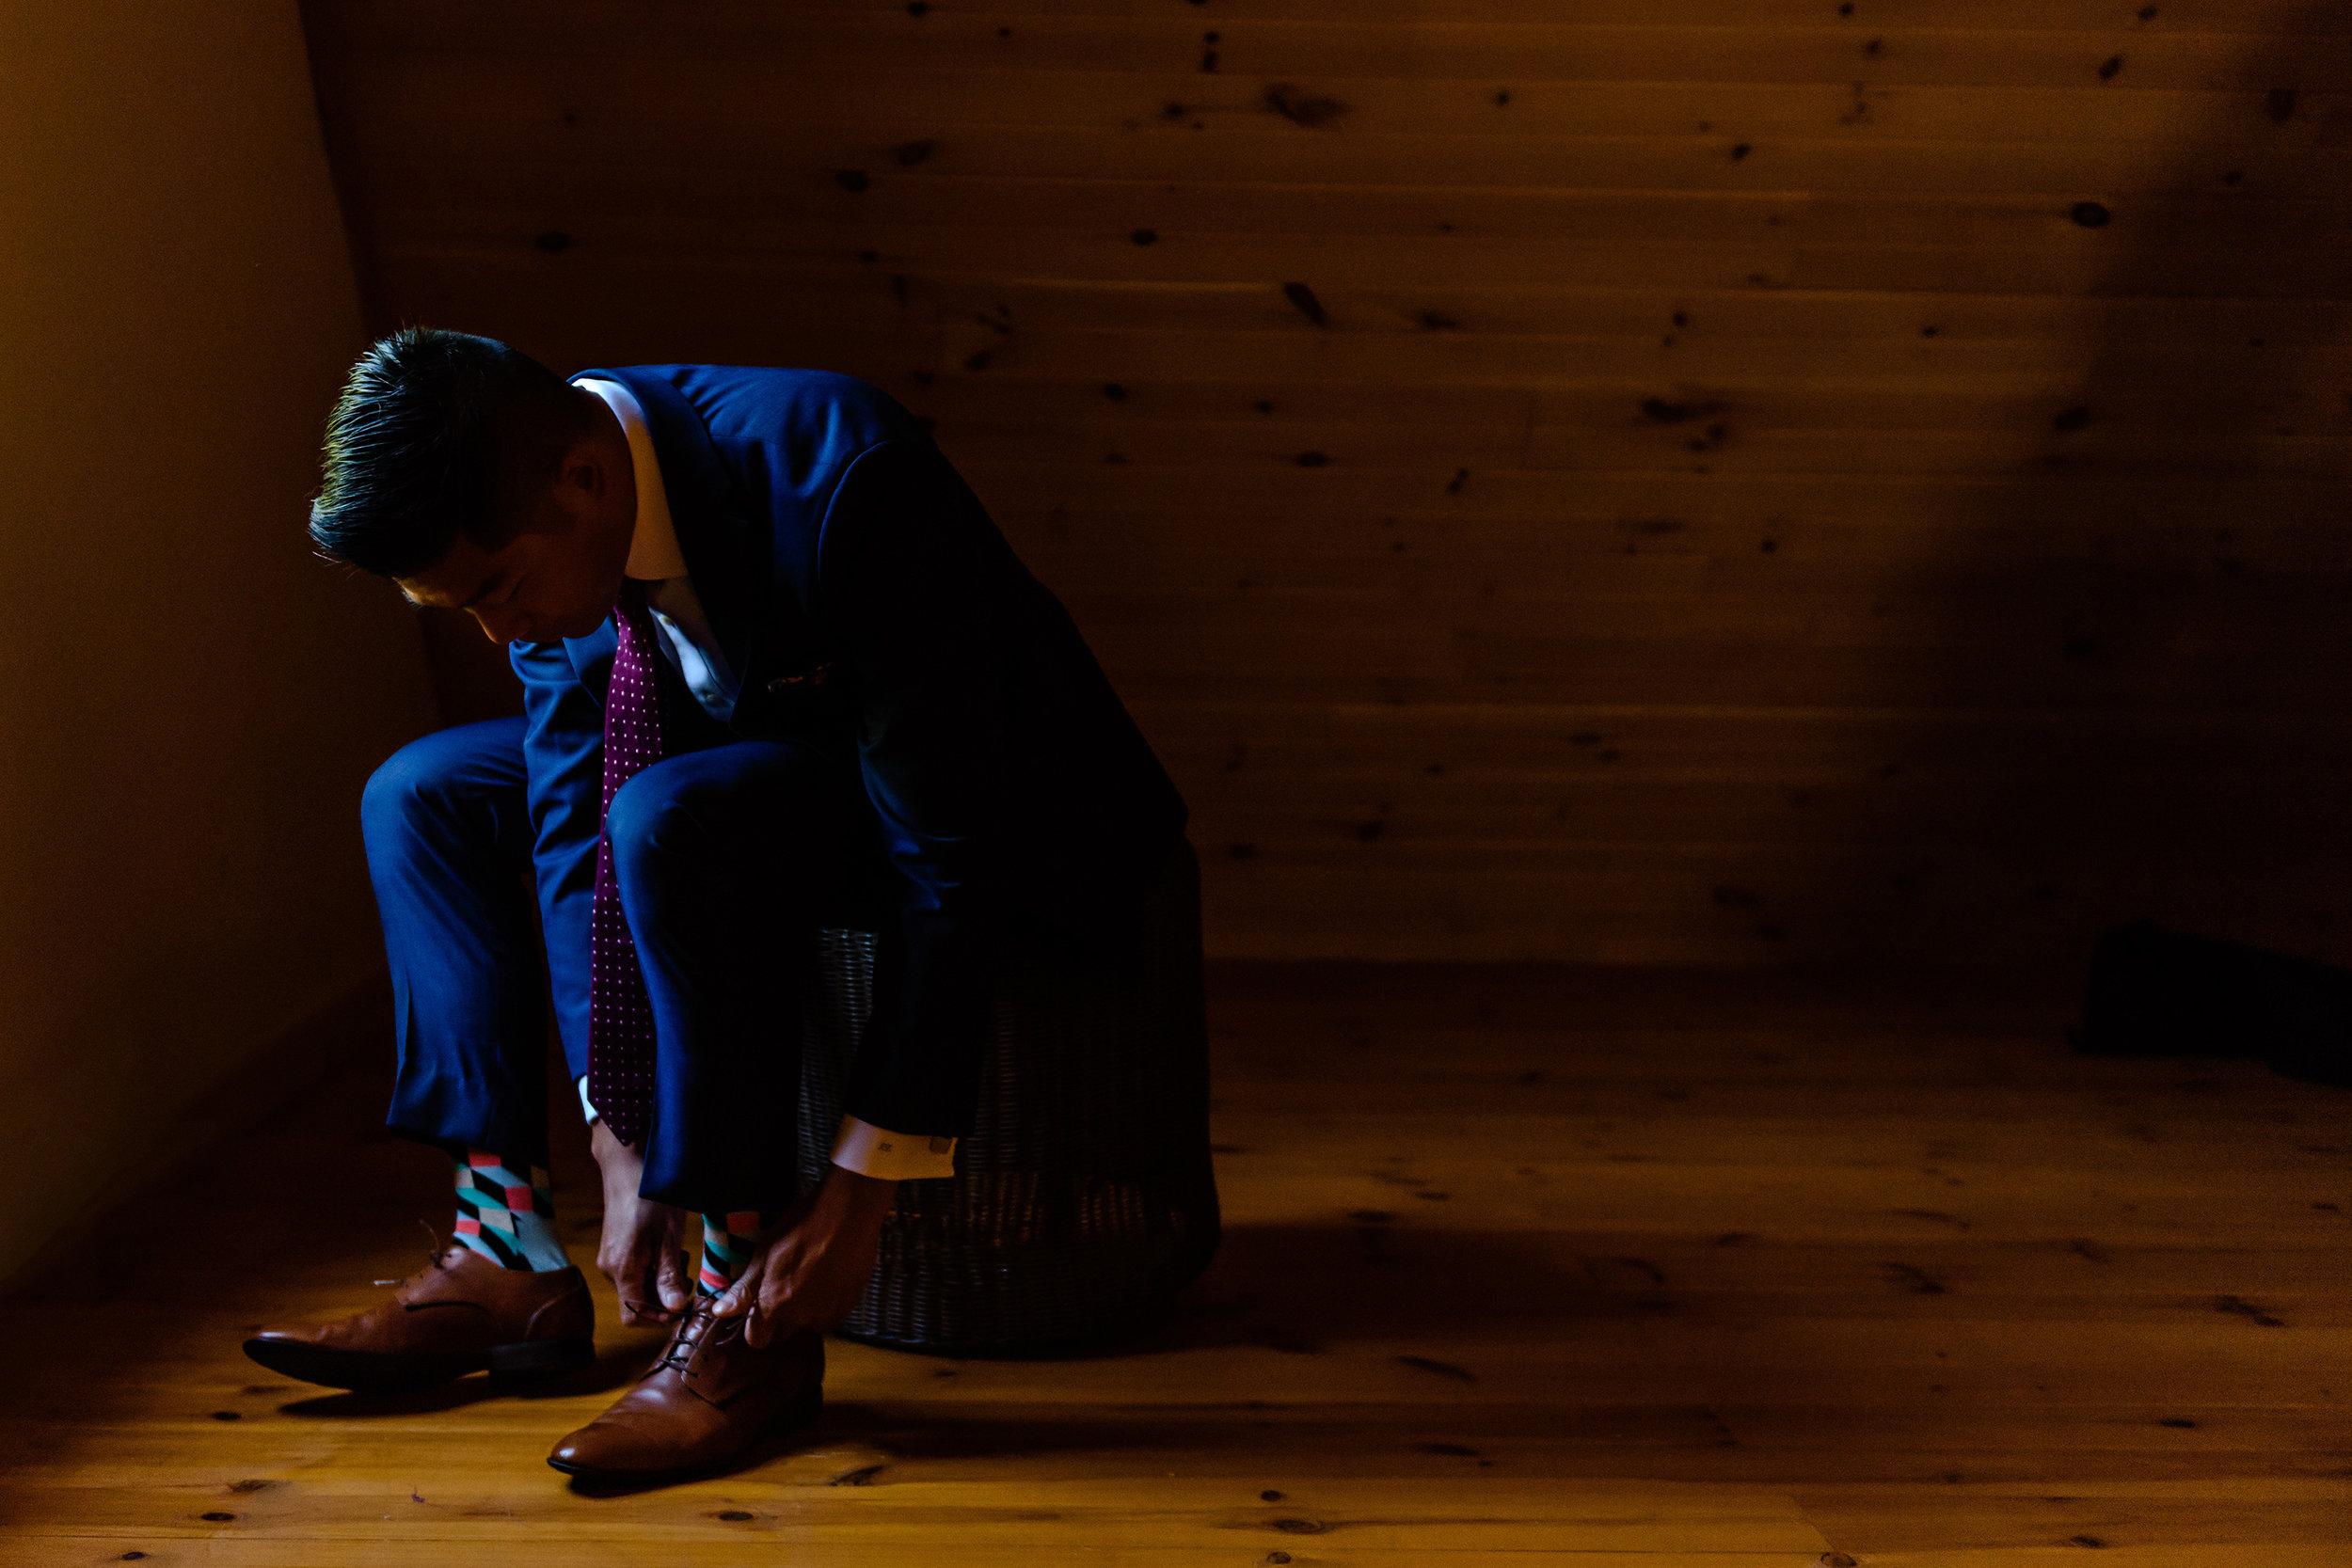 groom-tieing-his-shoe-before-a-le-belvedere-wedding-in-wakefield-quebec.jpg